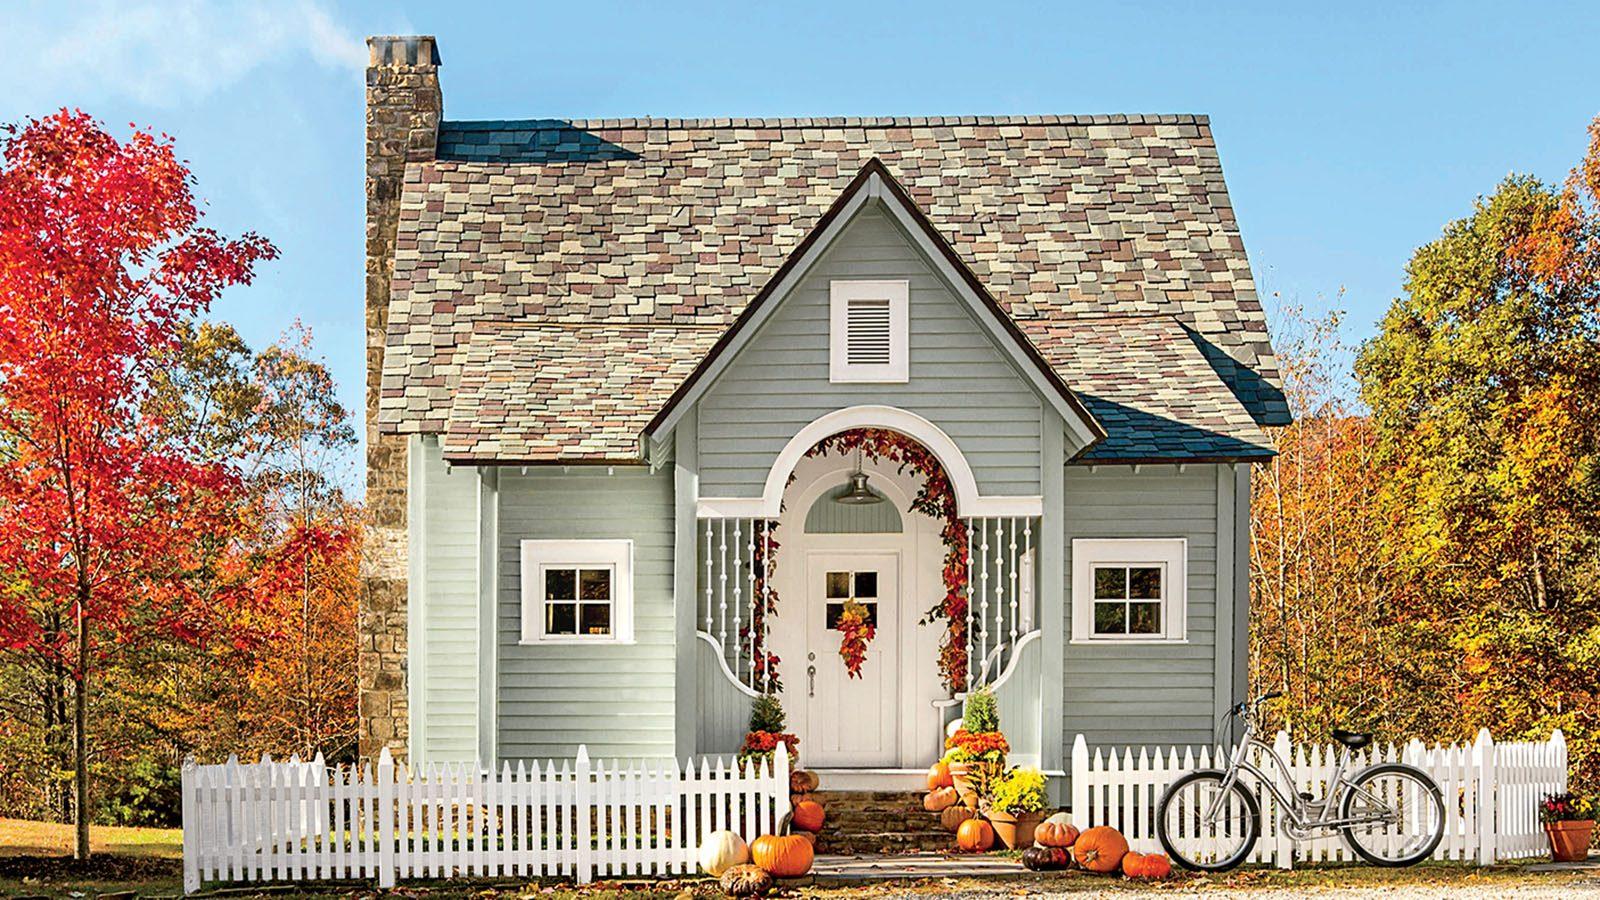 Sell my house fast Carmel